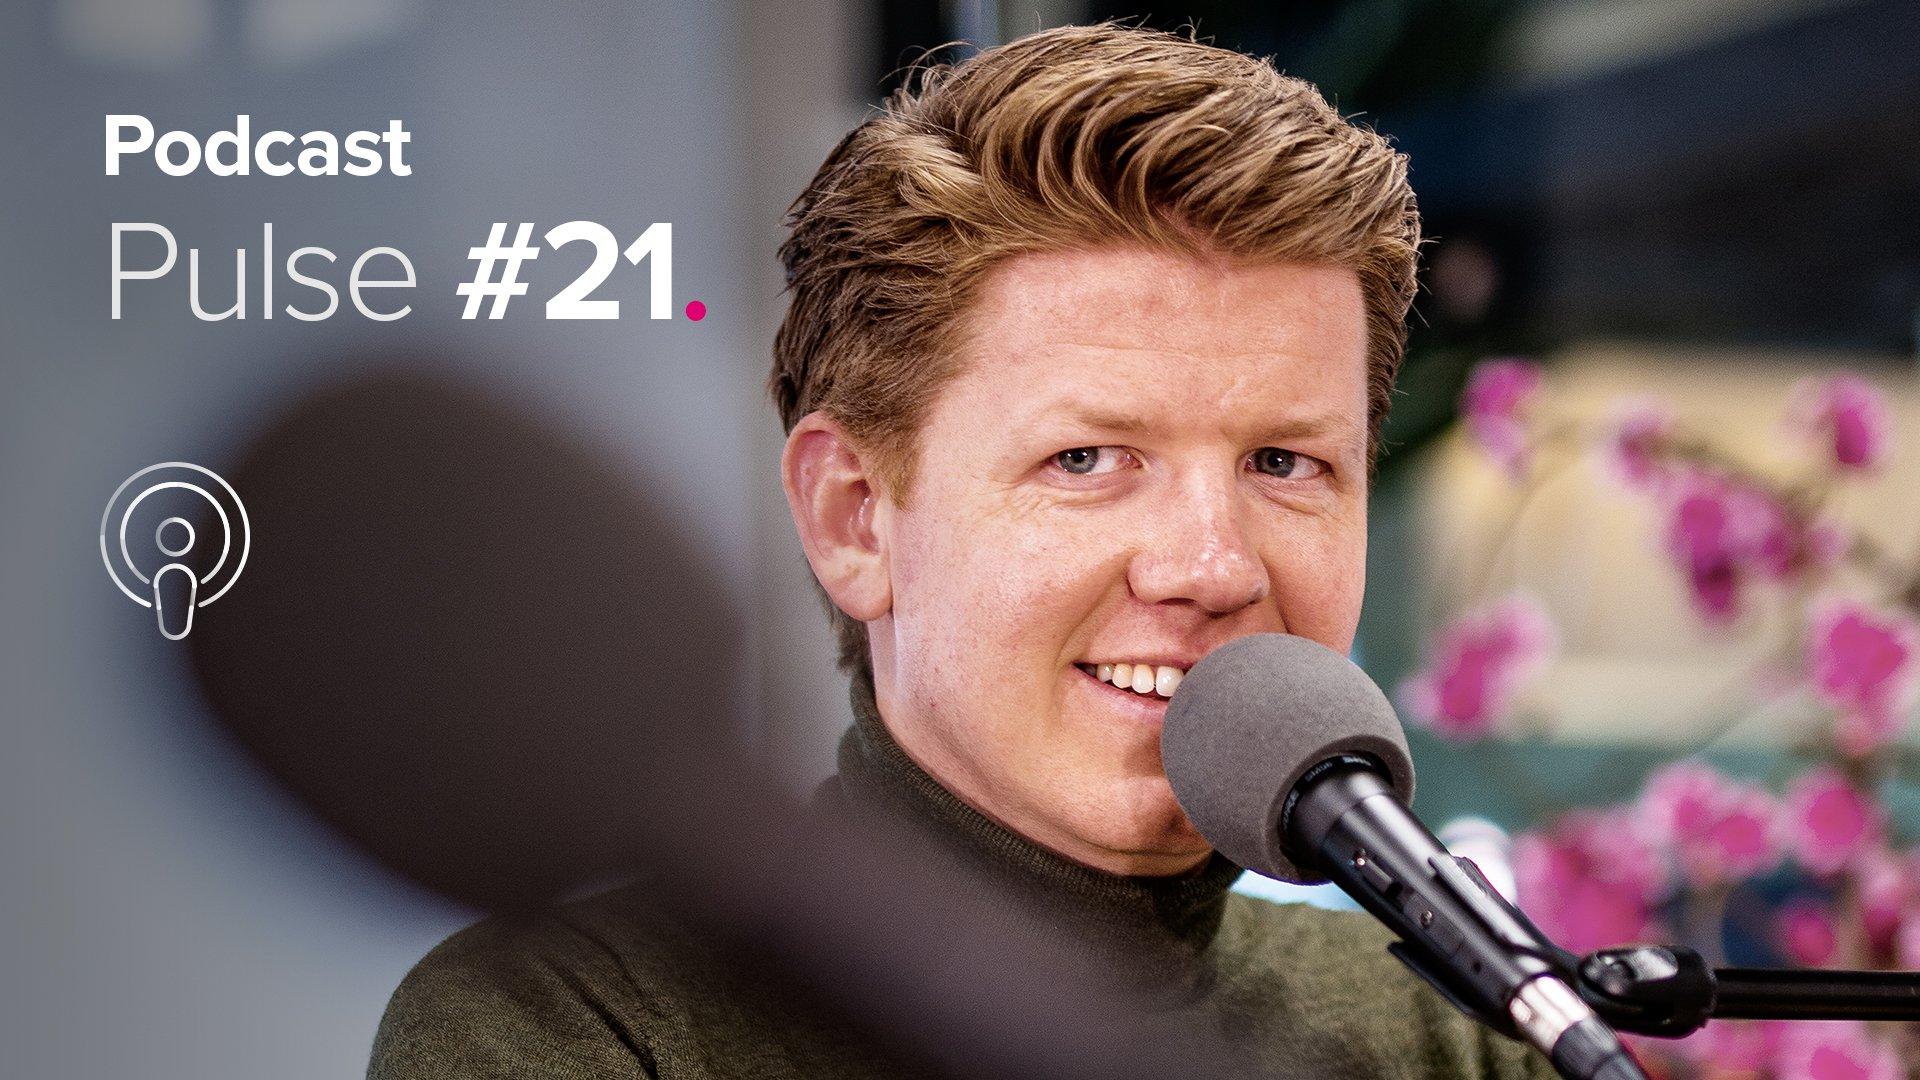 Podcast Digital Brains Pulse #21